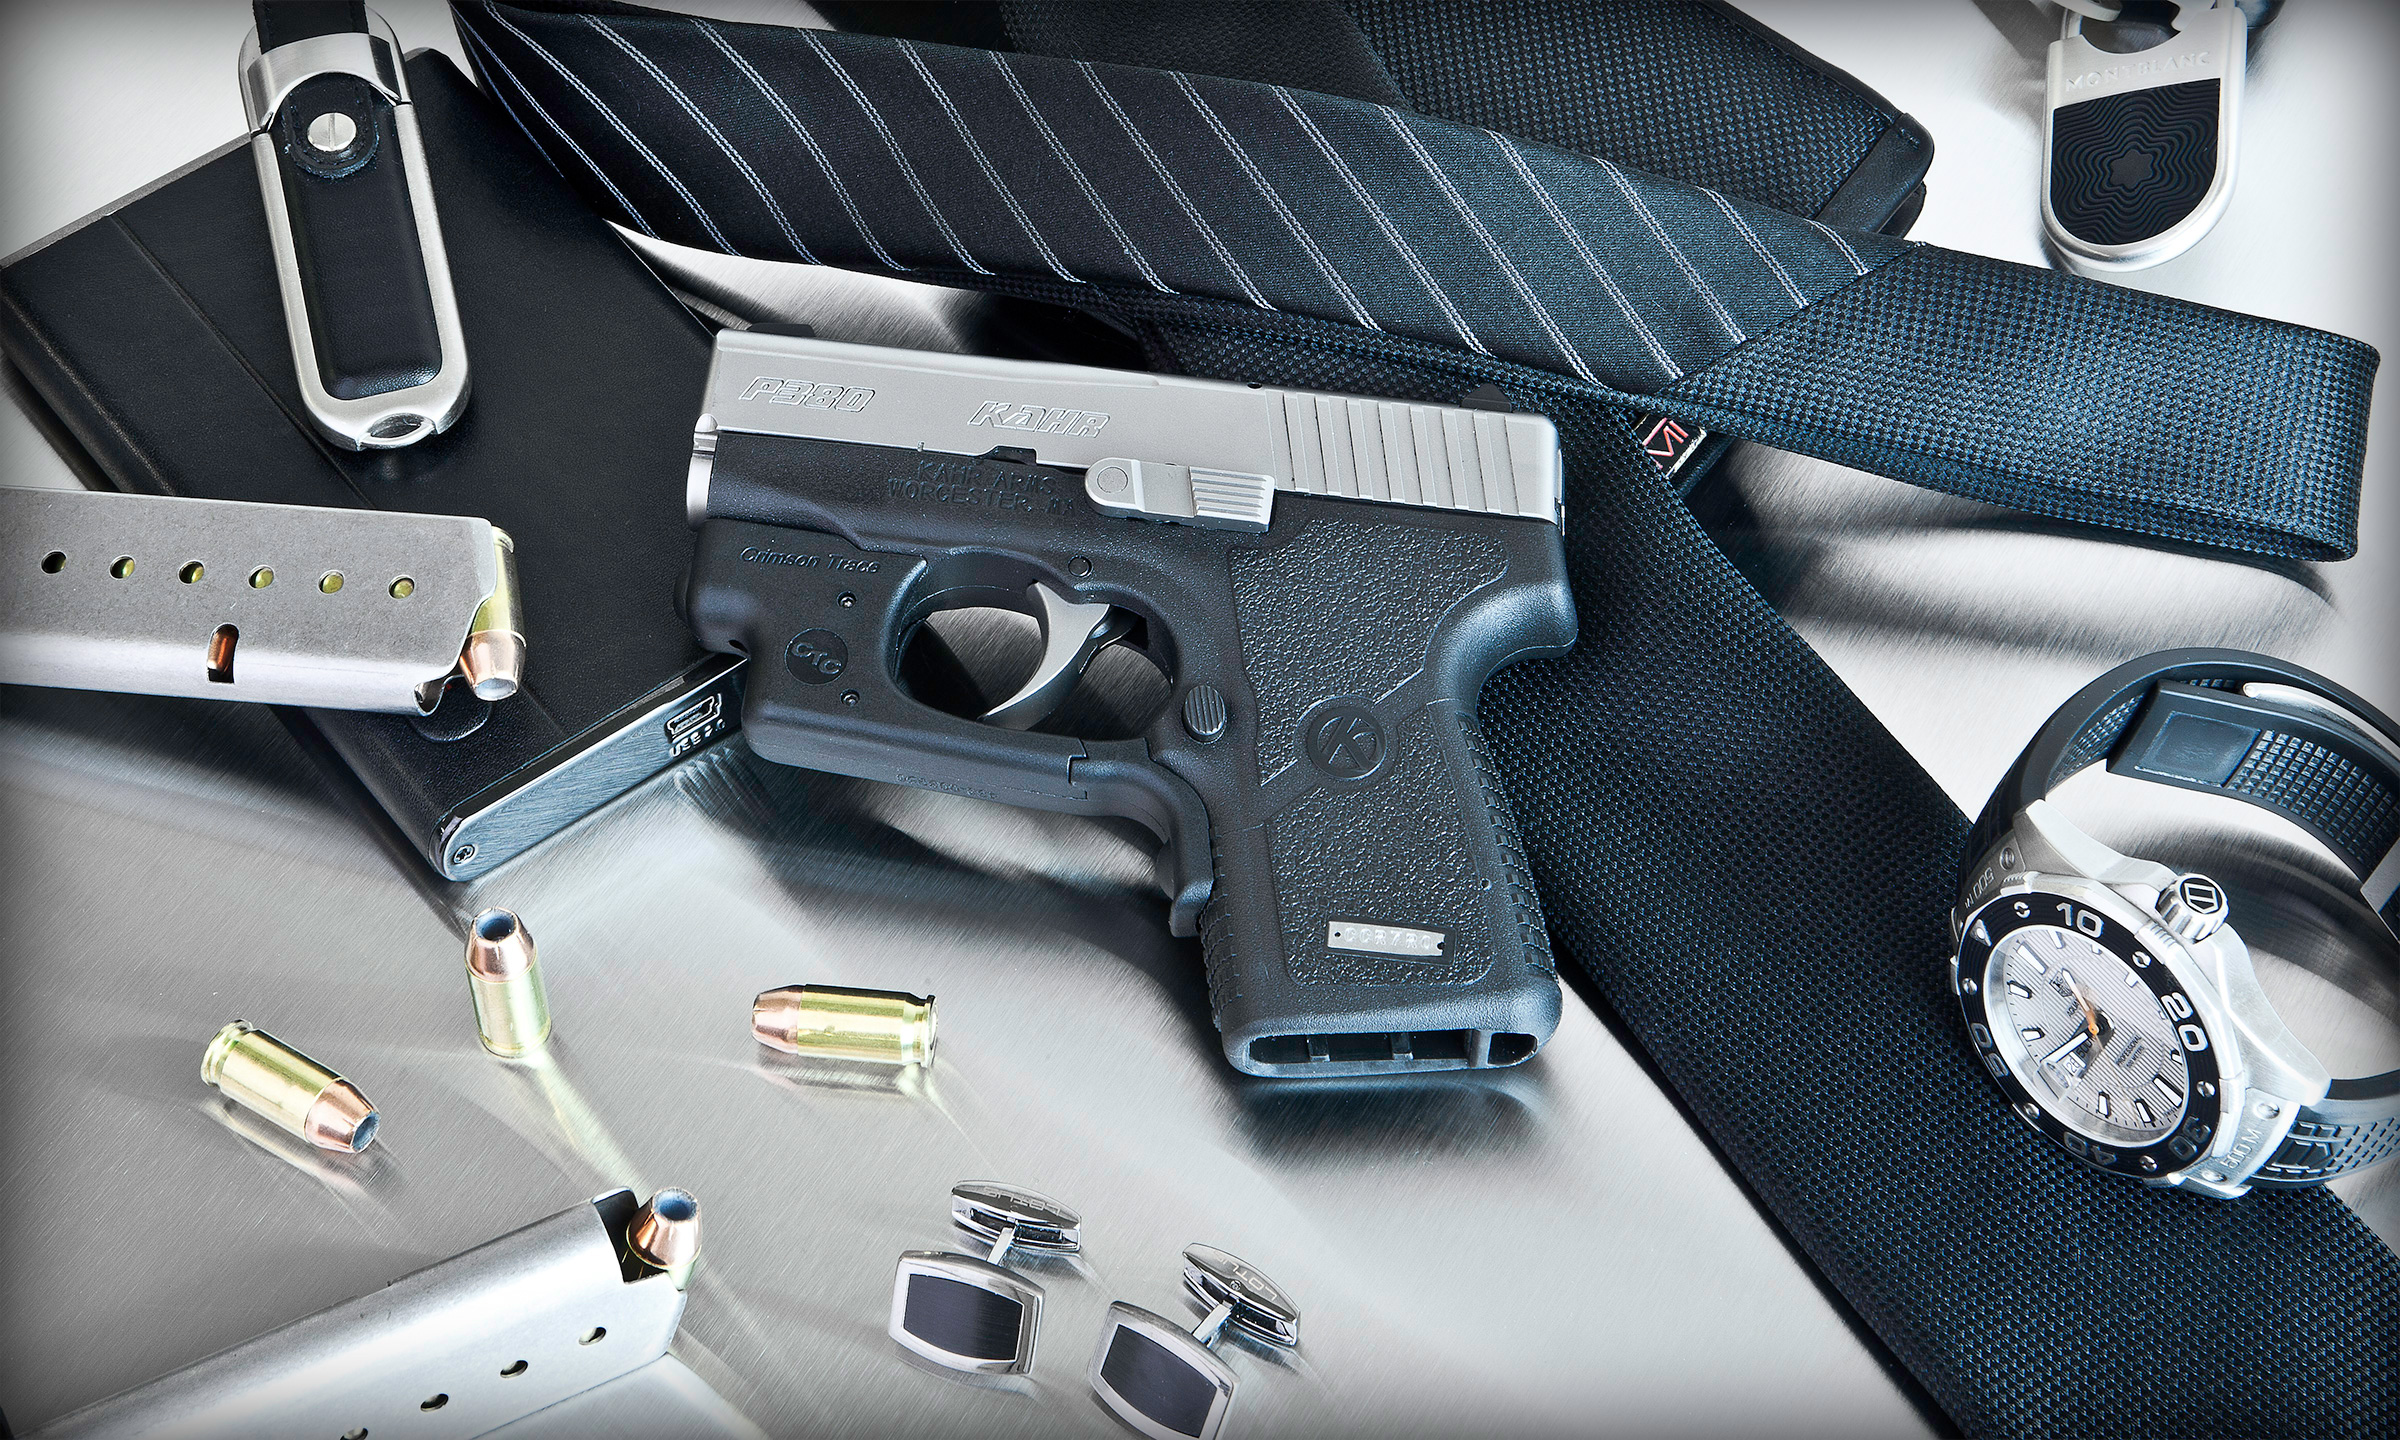 Kahr P380 micro compact pistol